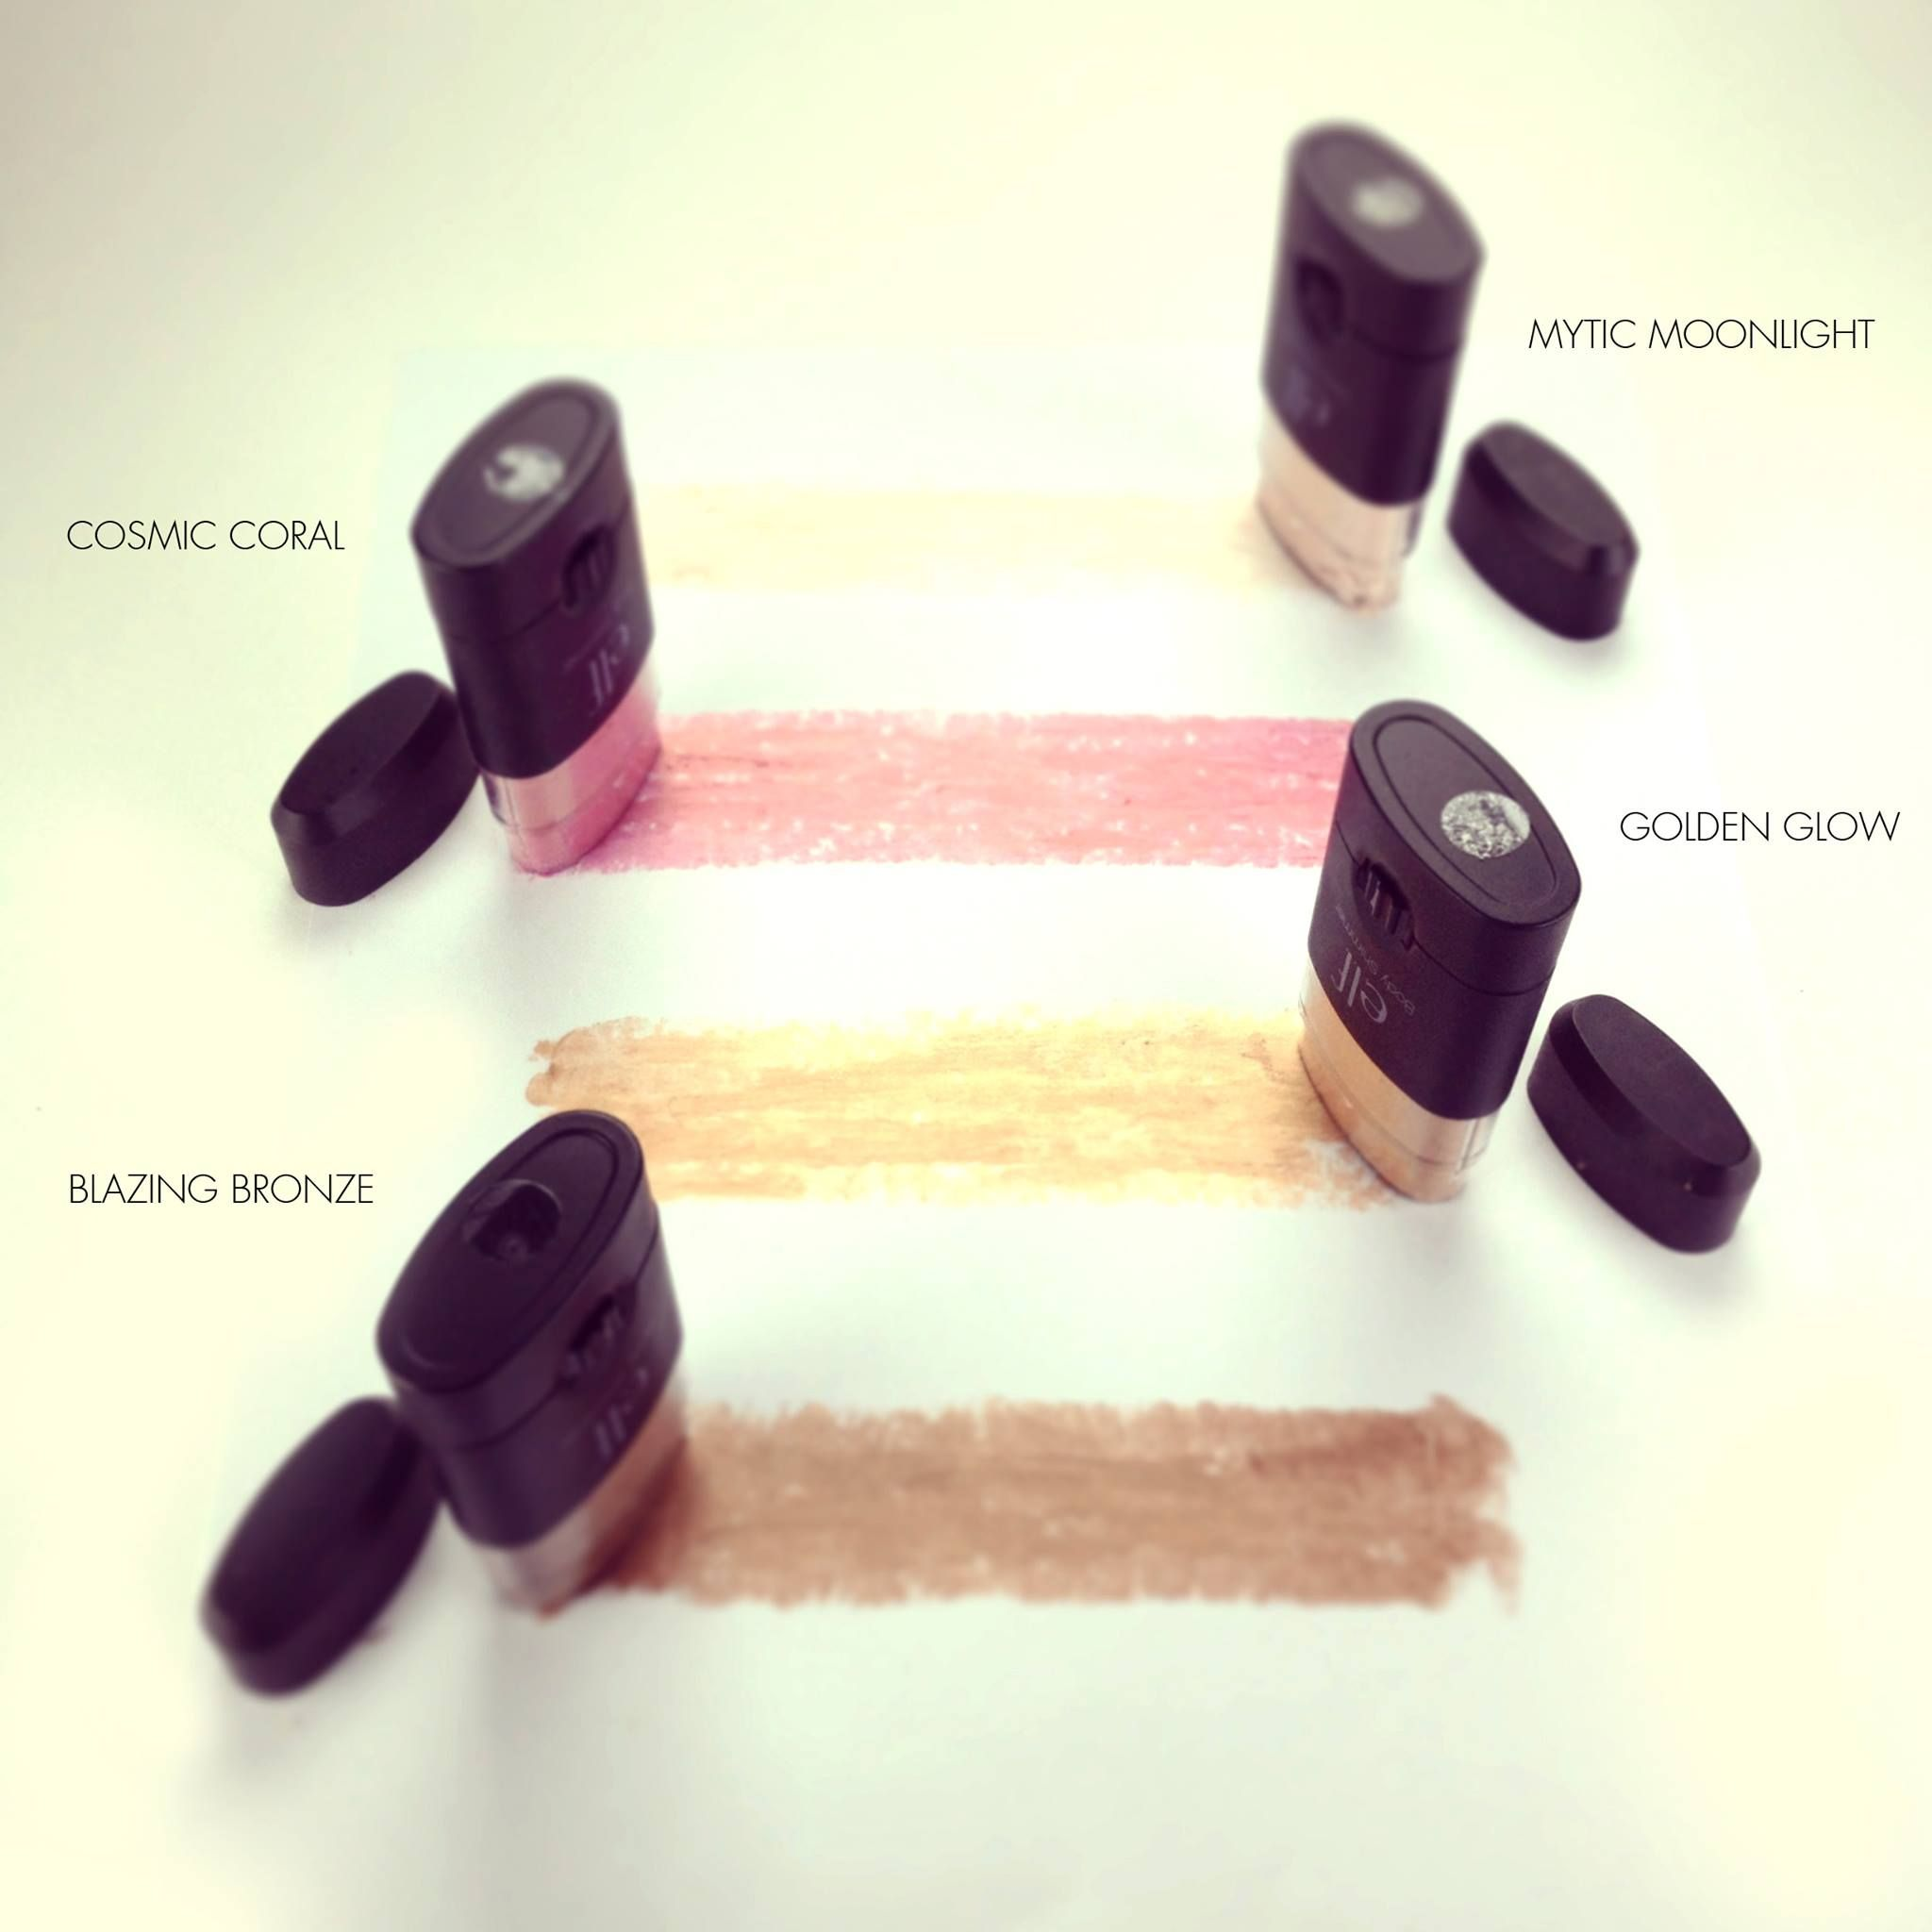 elf Studio Body Shimmer swatches Makeup gift sets, Best